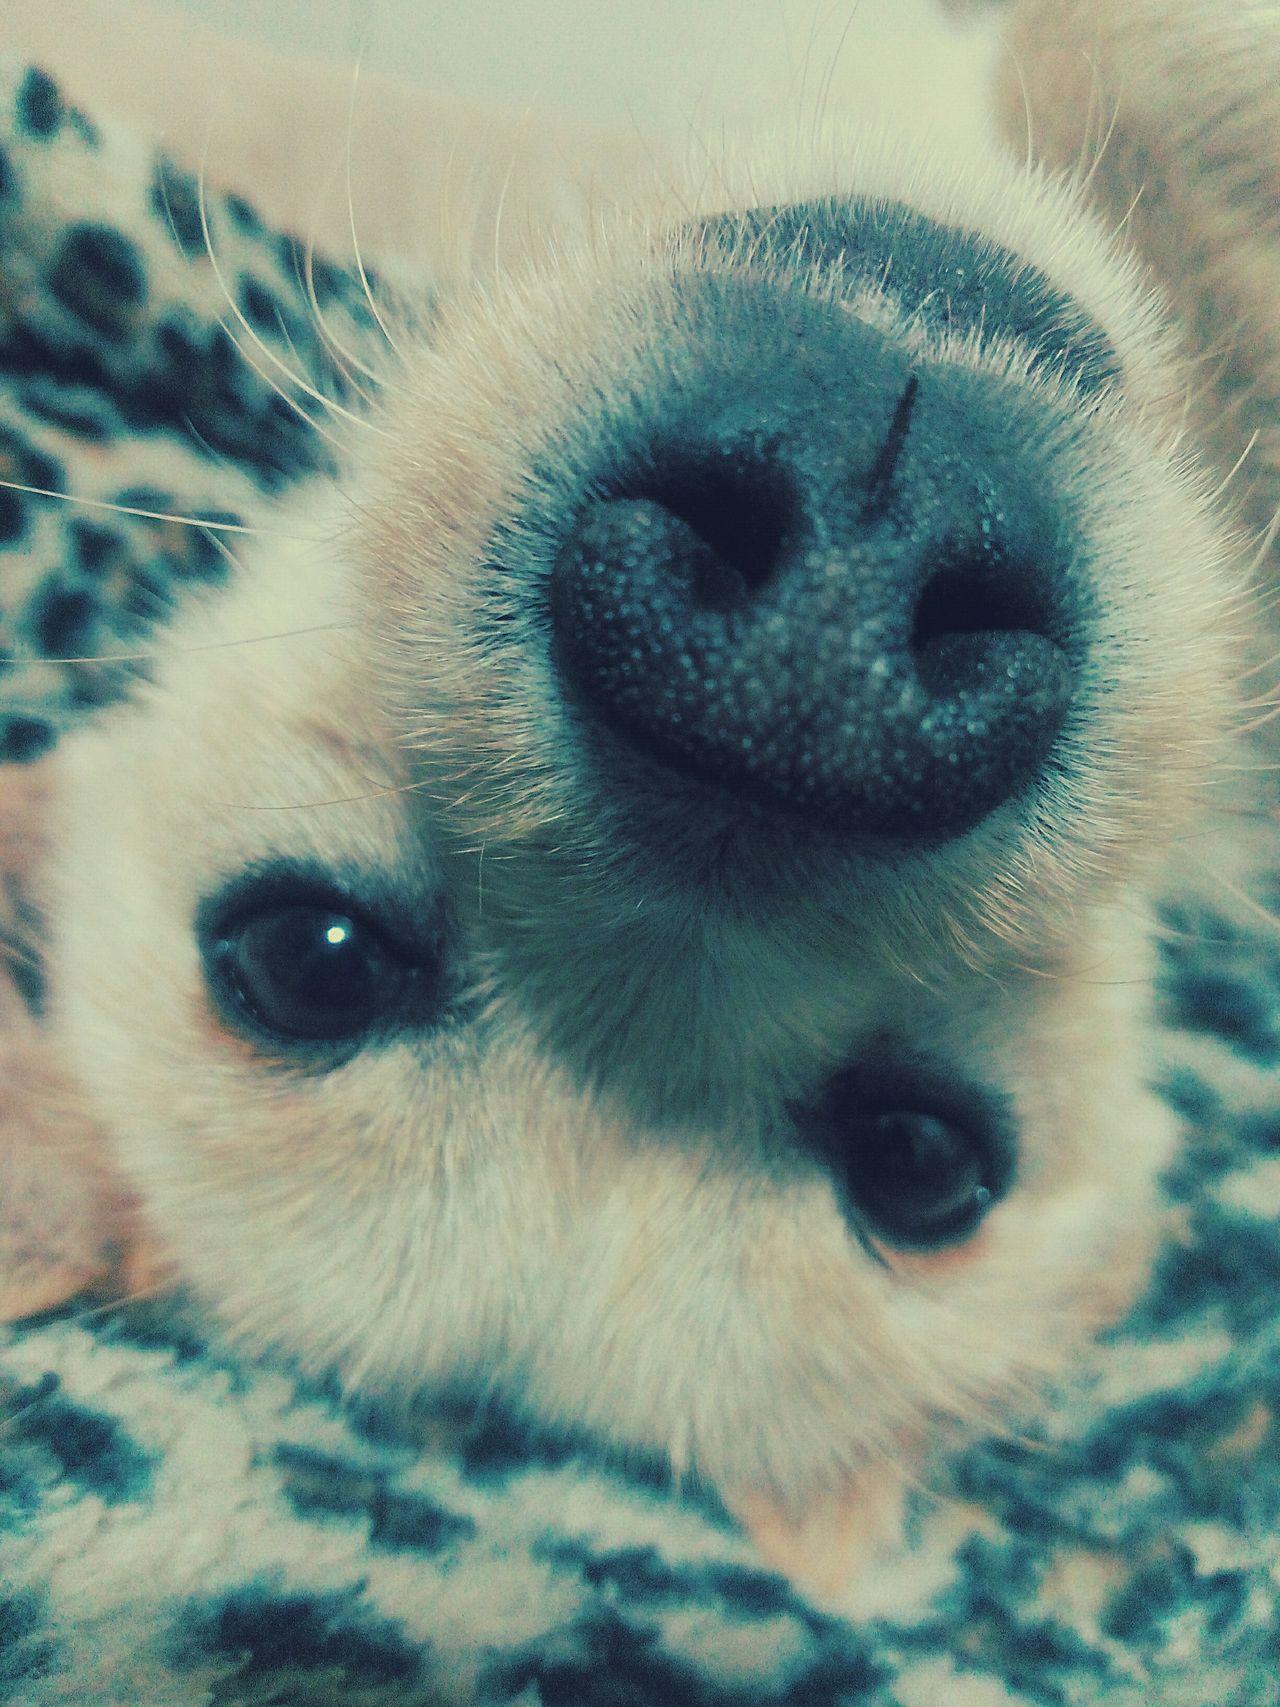 Ringo Dog❤ Lovedogs Loveanimals Letmetakeaselfie Selfietime Nose Check This Out Hello World Hi! Fun Animals Taking Photos